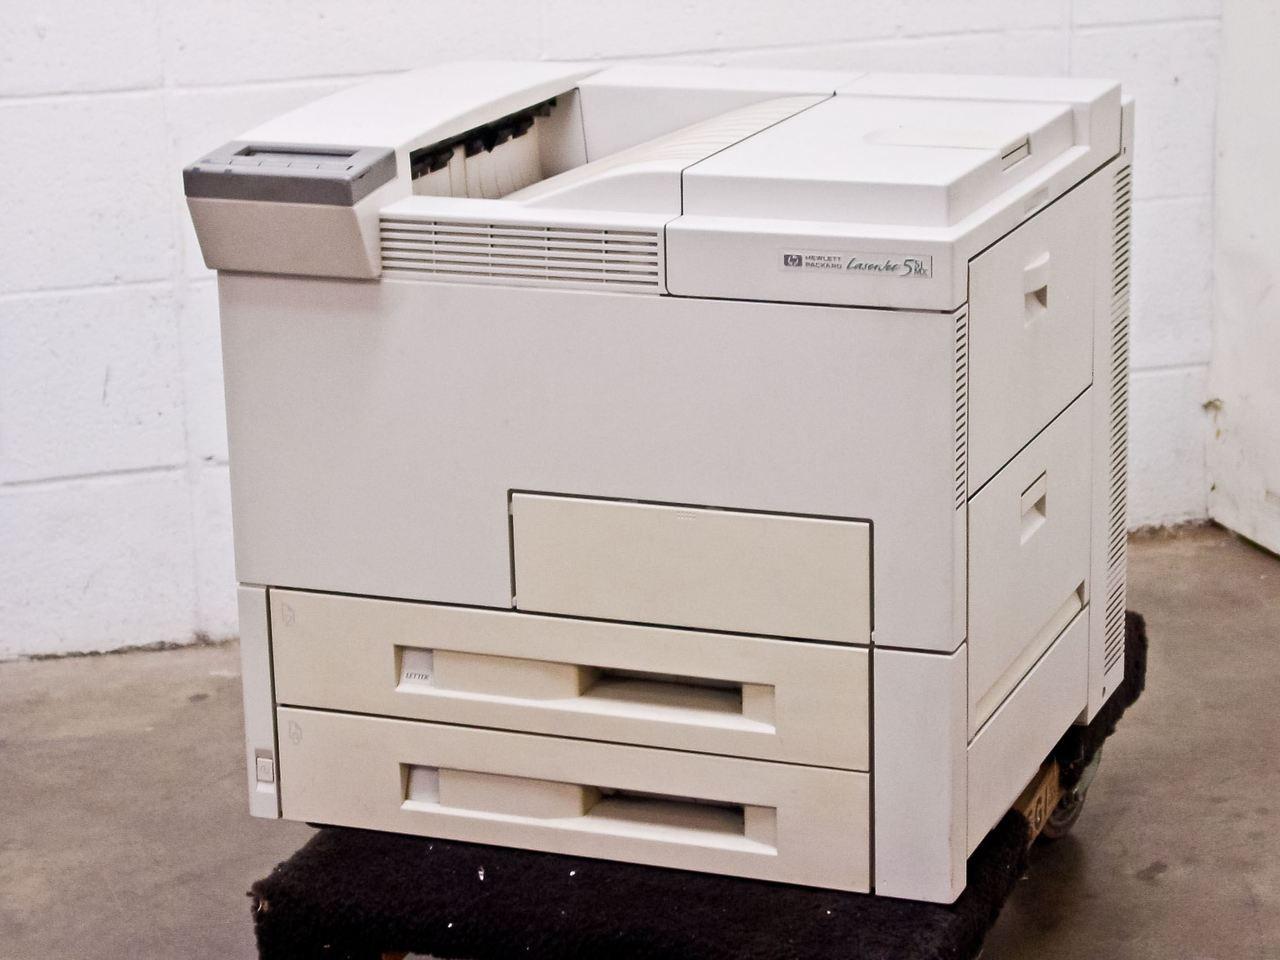 hp c3167a laserjet 5si mx printer recycledgoods com rh recycledgoods com hp laserjet 5si mx manual hp laserjet 5si service manual